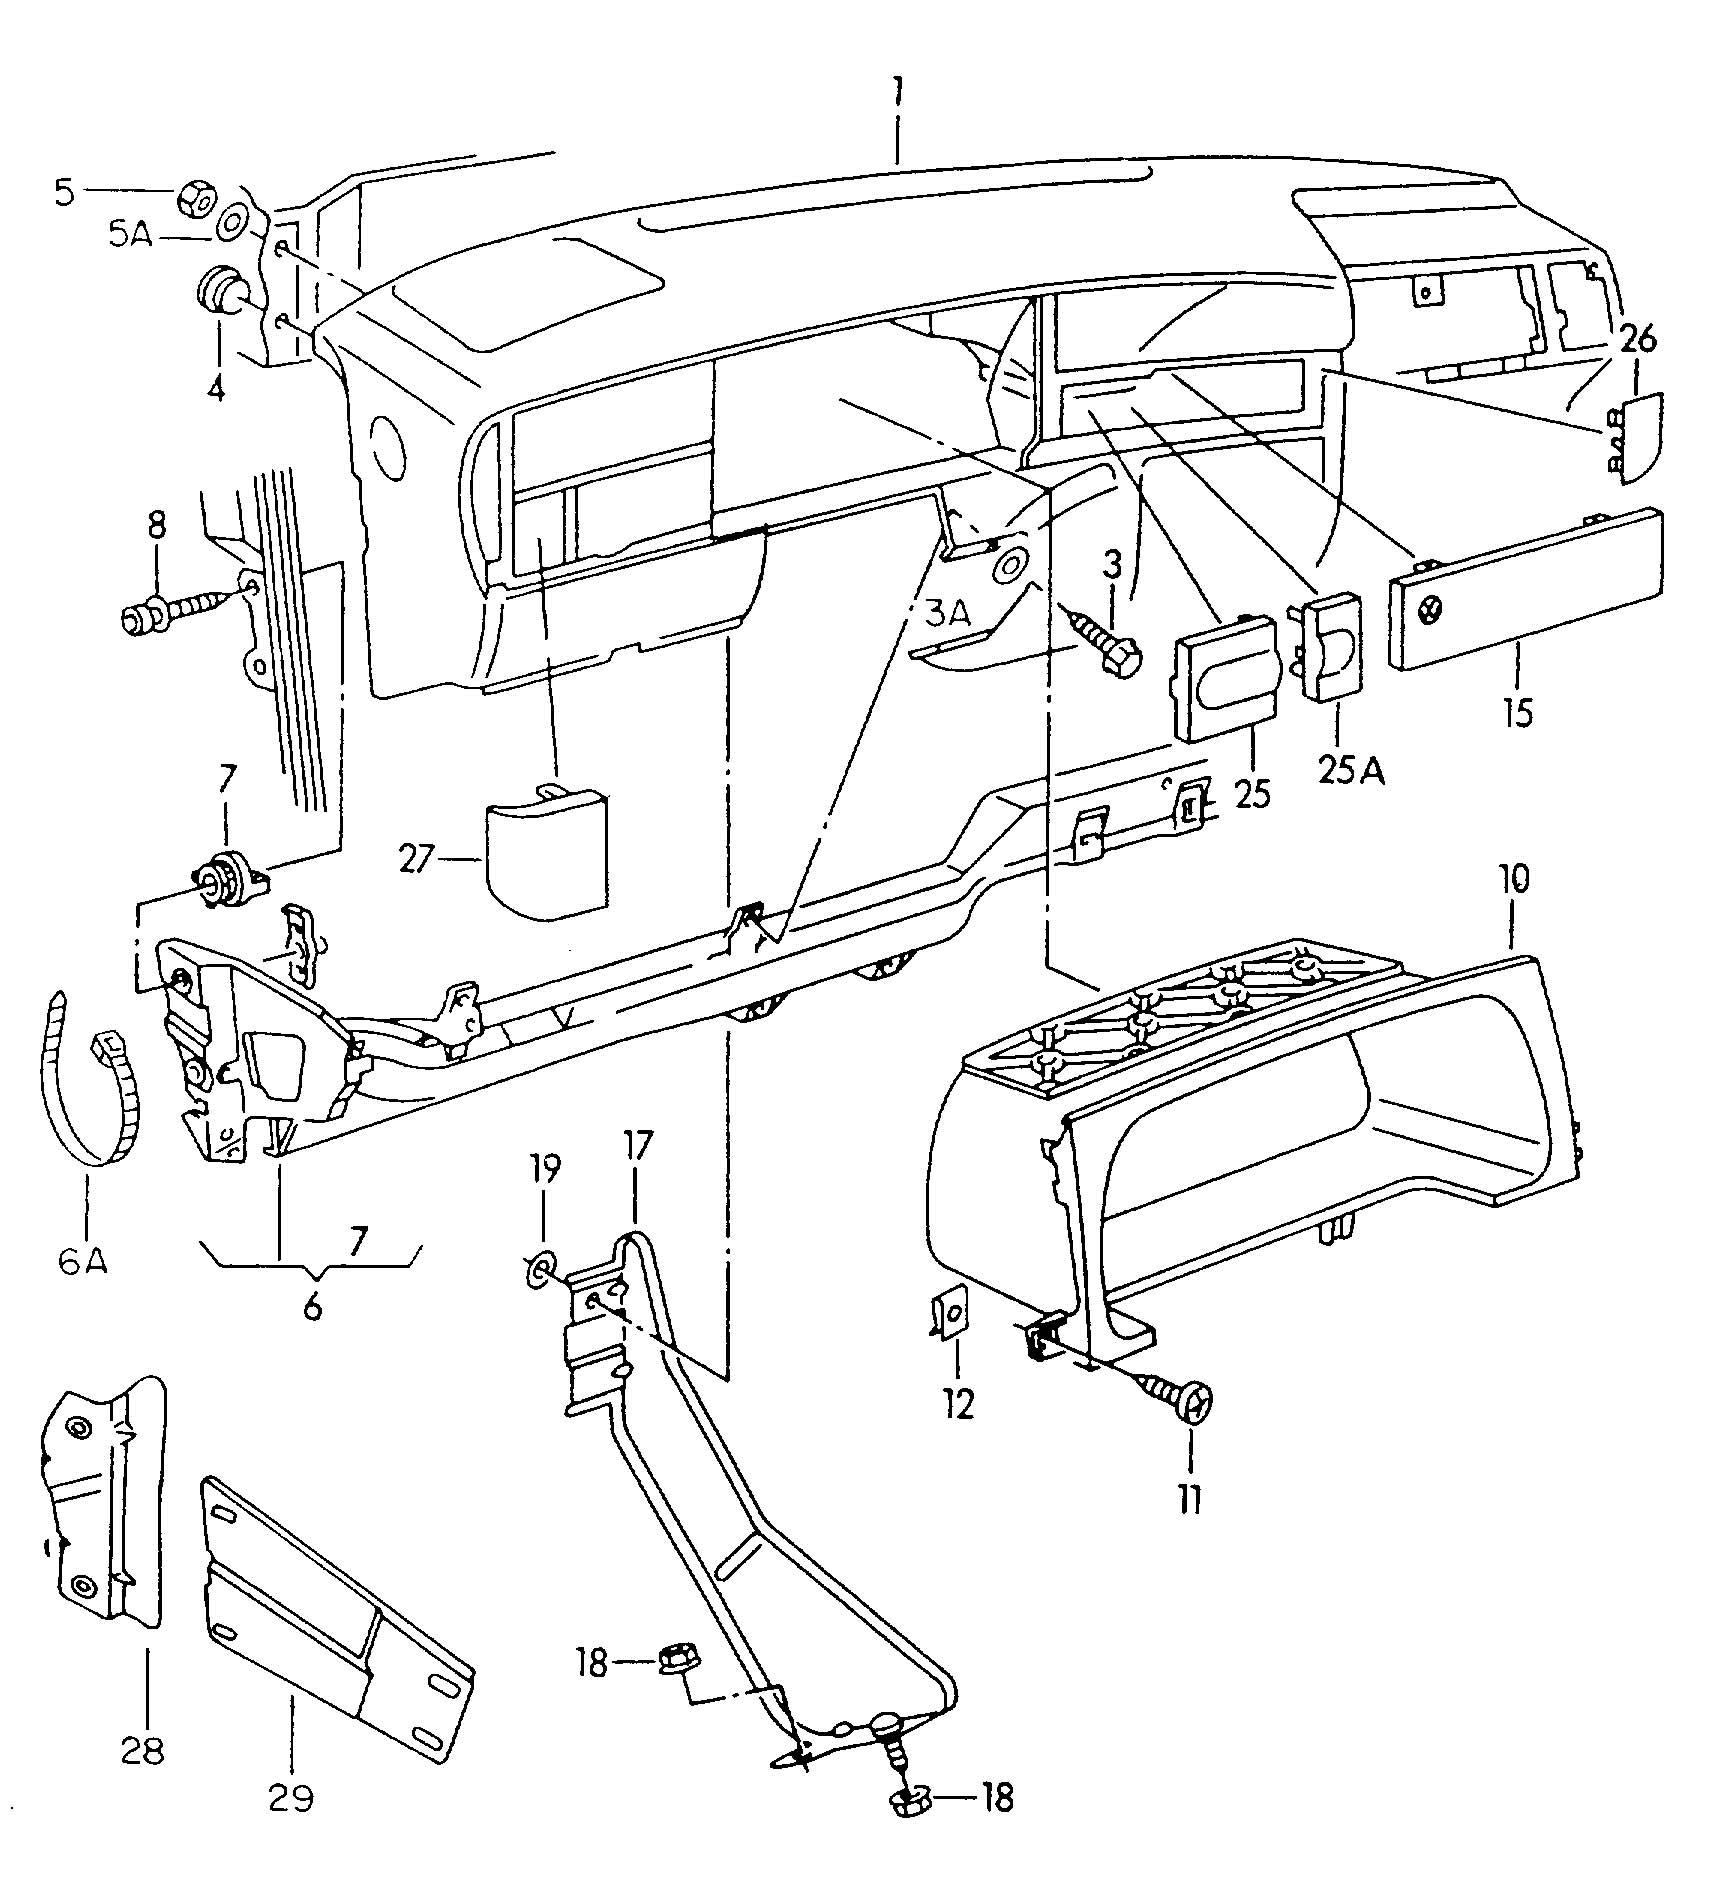 99 vw beetle model diagram